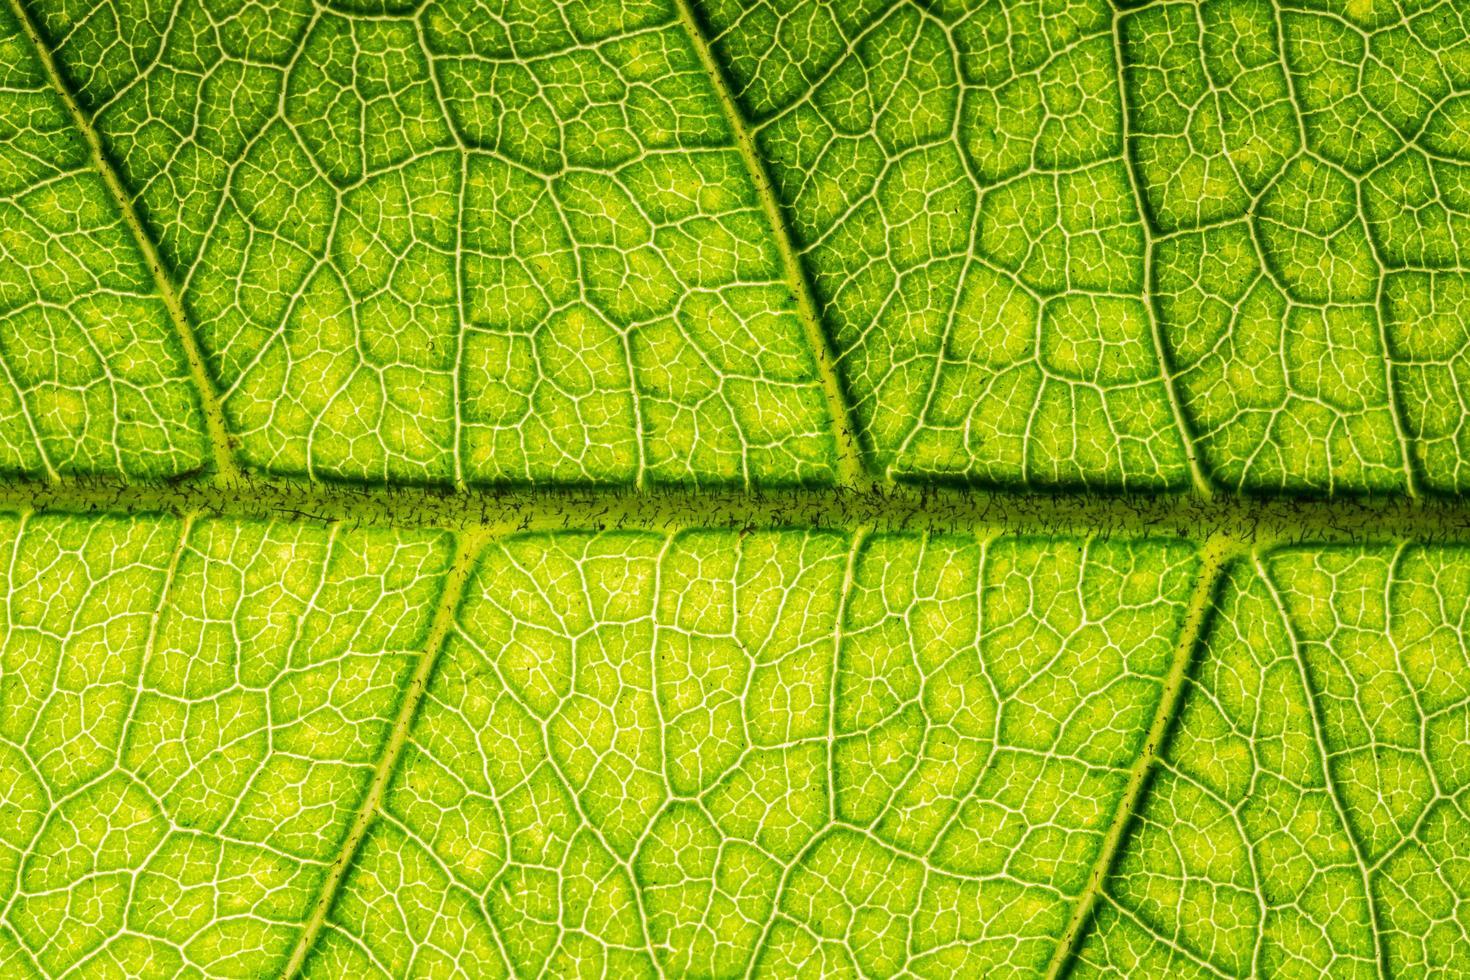 motif de feuilles vertes photo